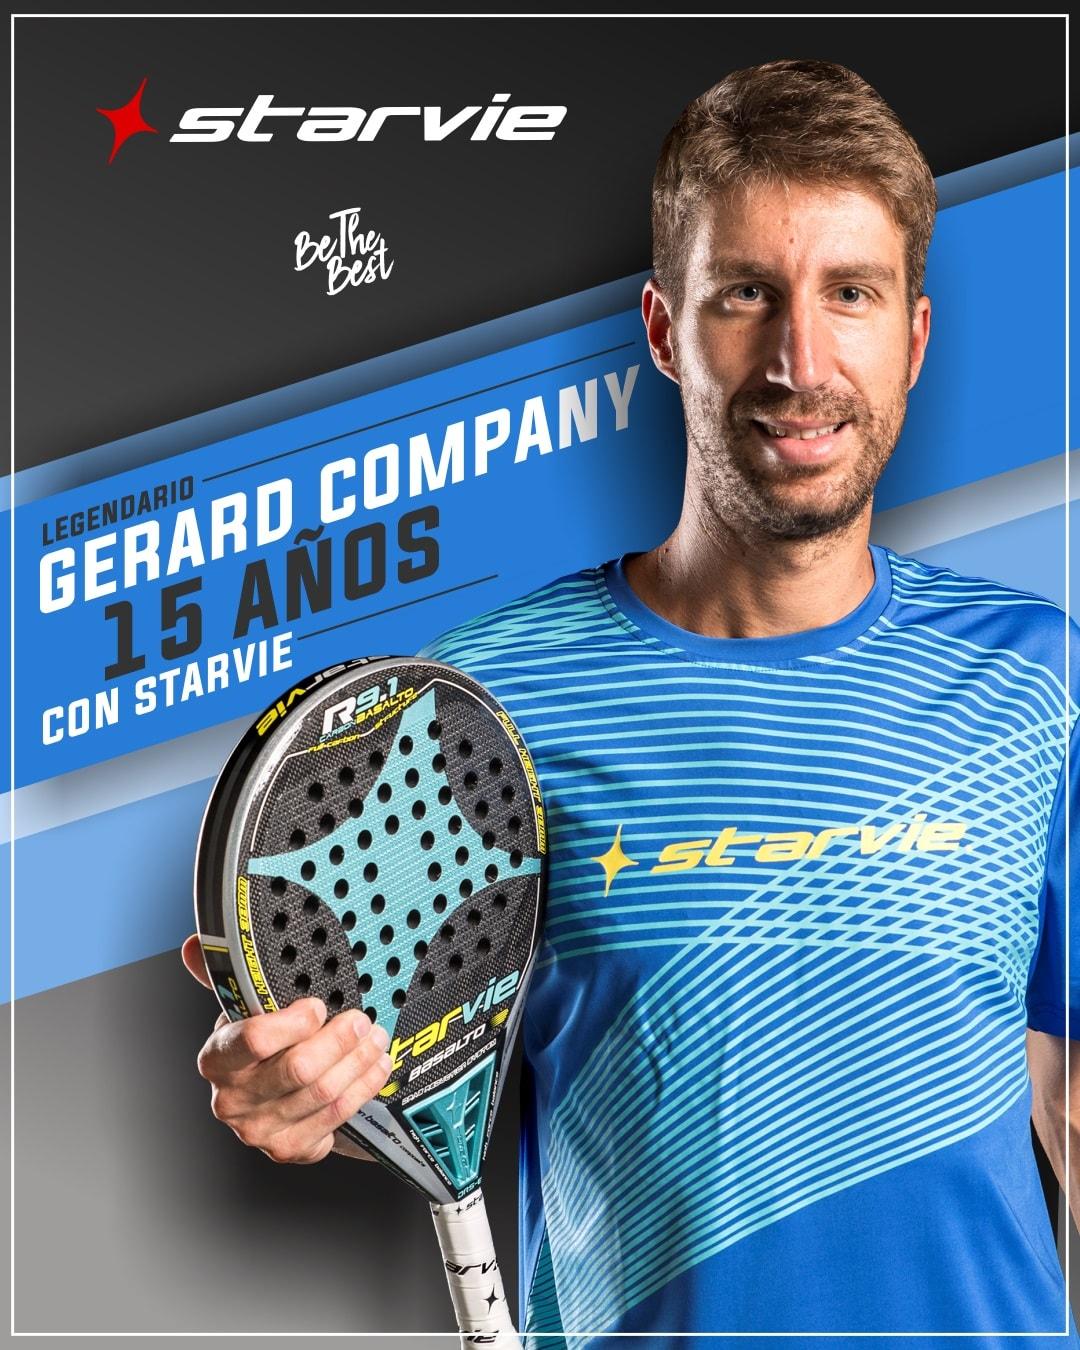 gerard-company-renovacion-starvie